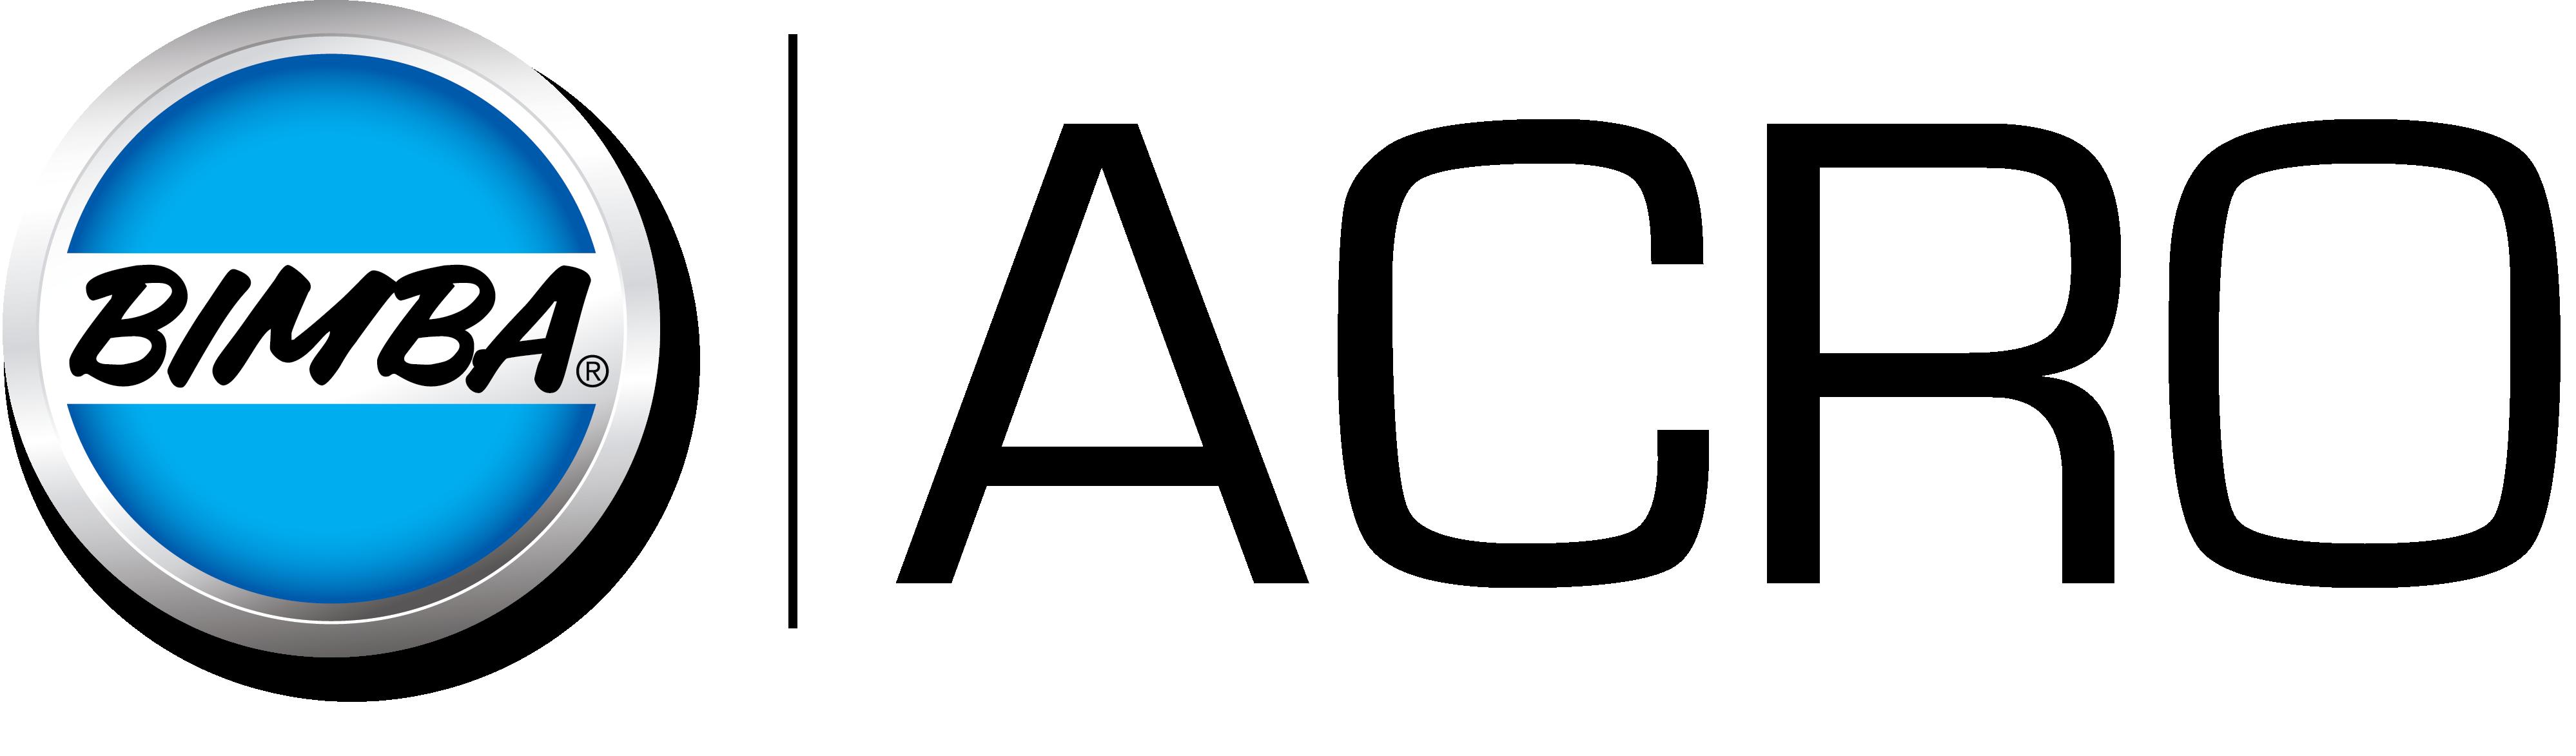 New_Bimba_Dim_4c-logo-Acro.png